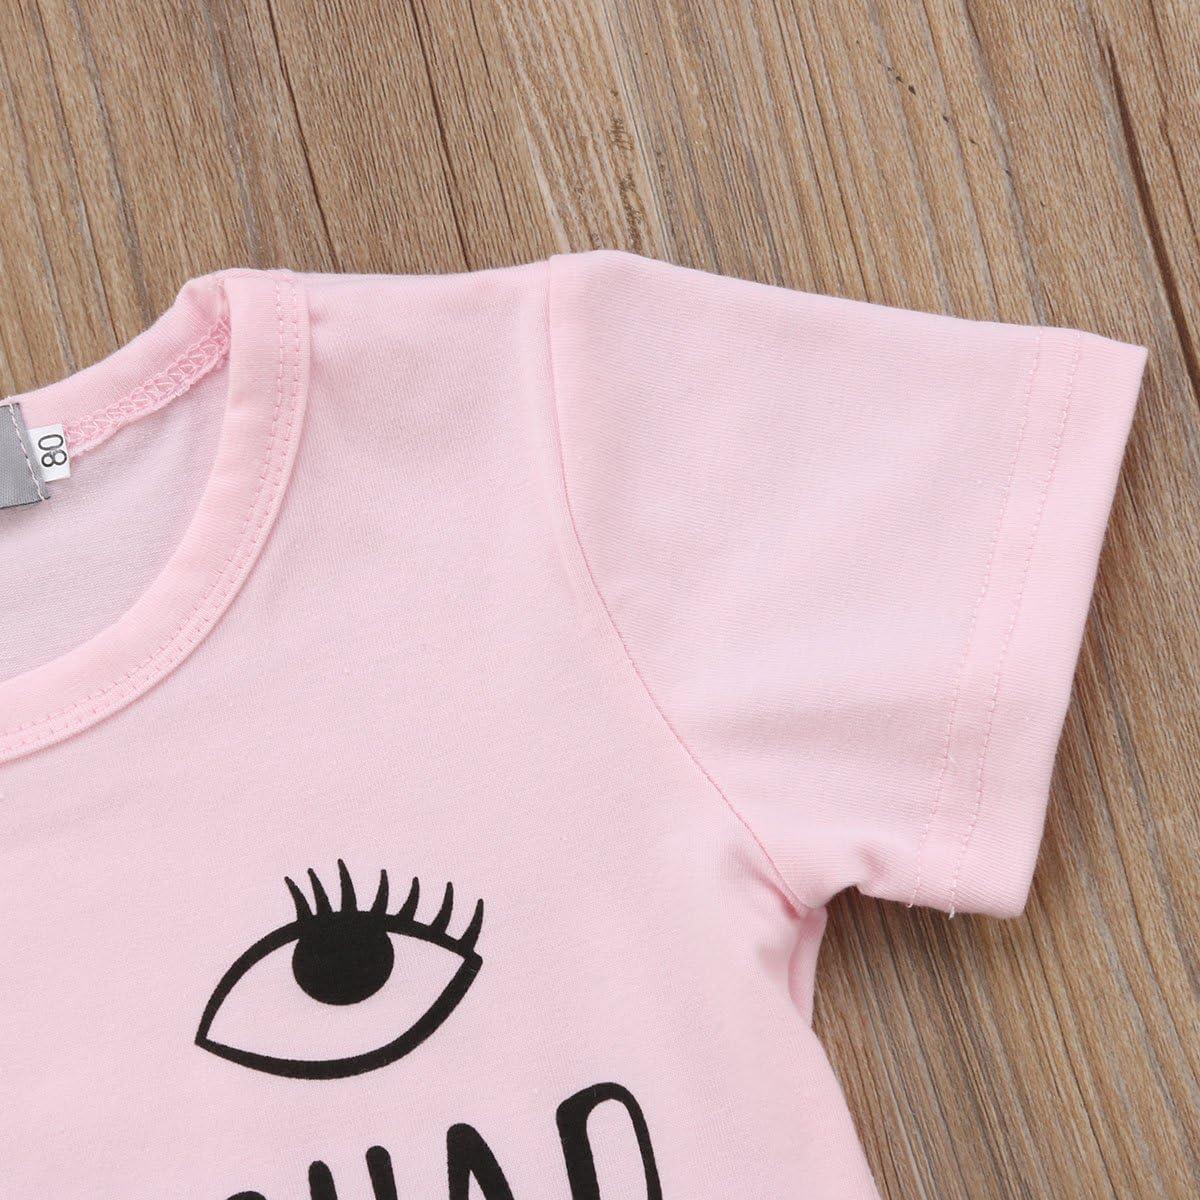 Toddler Baby Girl Summer Cute Wink Eyelash T Shirts Demin Skirt Clothes Set